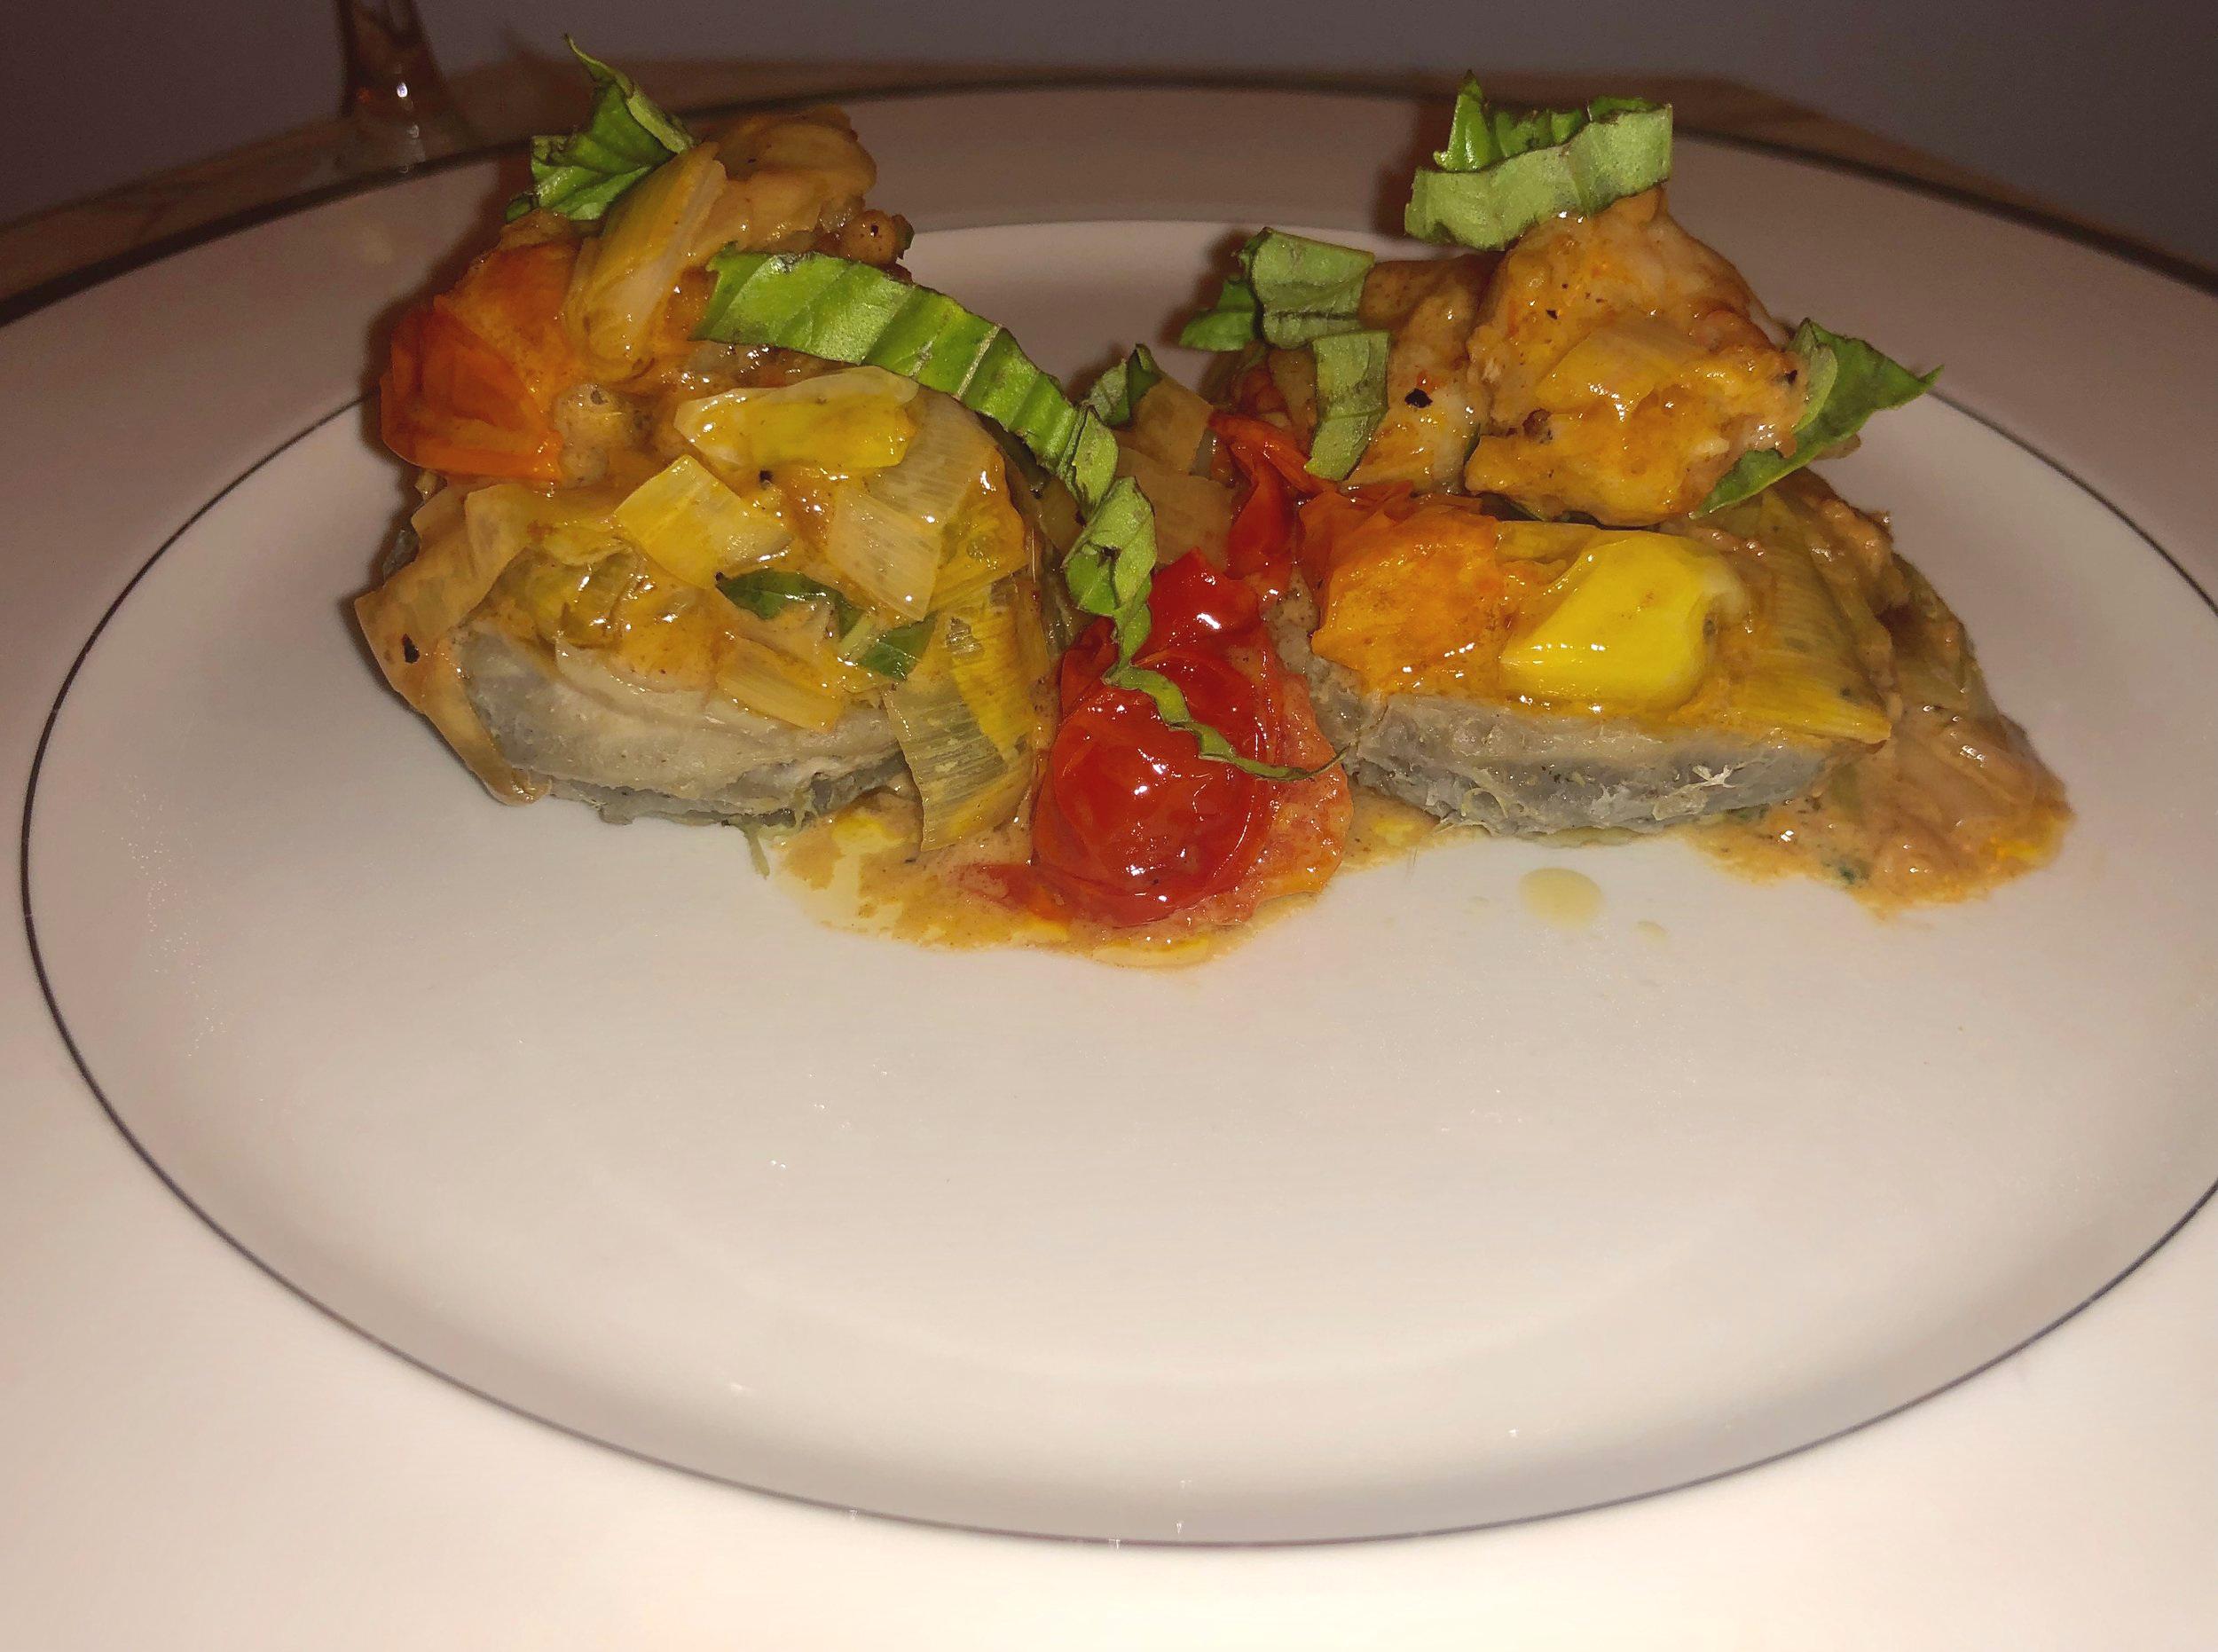 Blistered Tomatoes & Leek Creamy Shrimp Over Buttery Artichoke Bottoms - Simple Recipe, Impressive Presentation